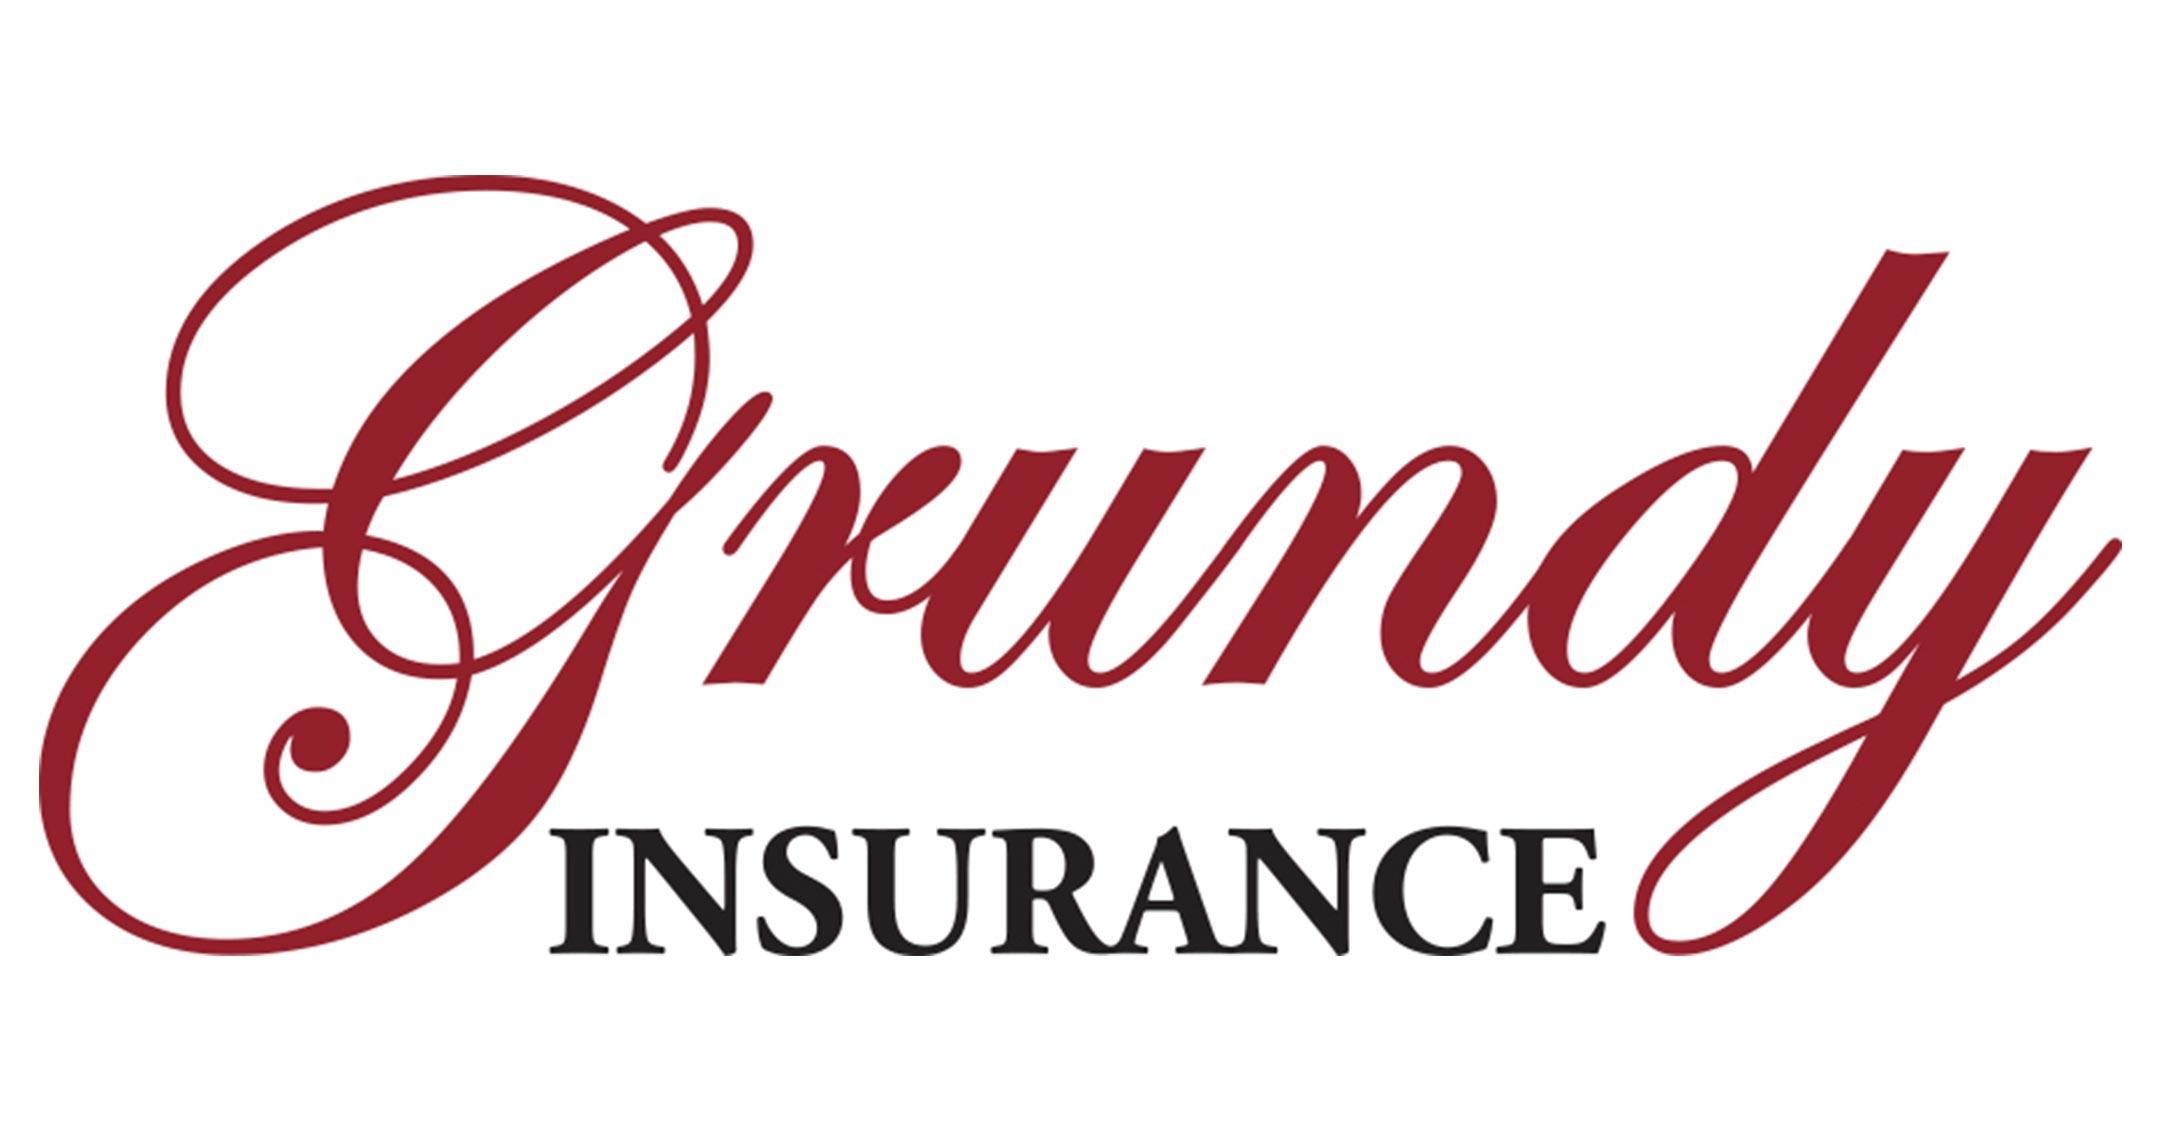 Grundy Insurance | Tavres.com